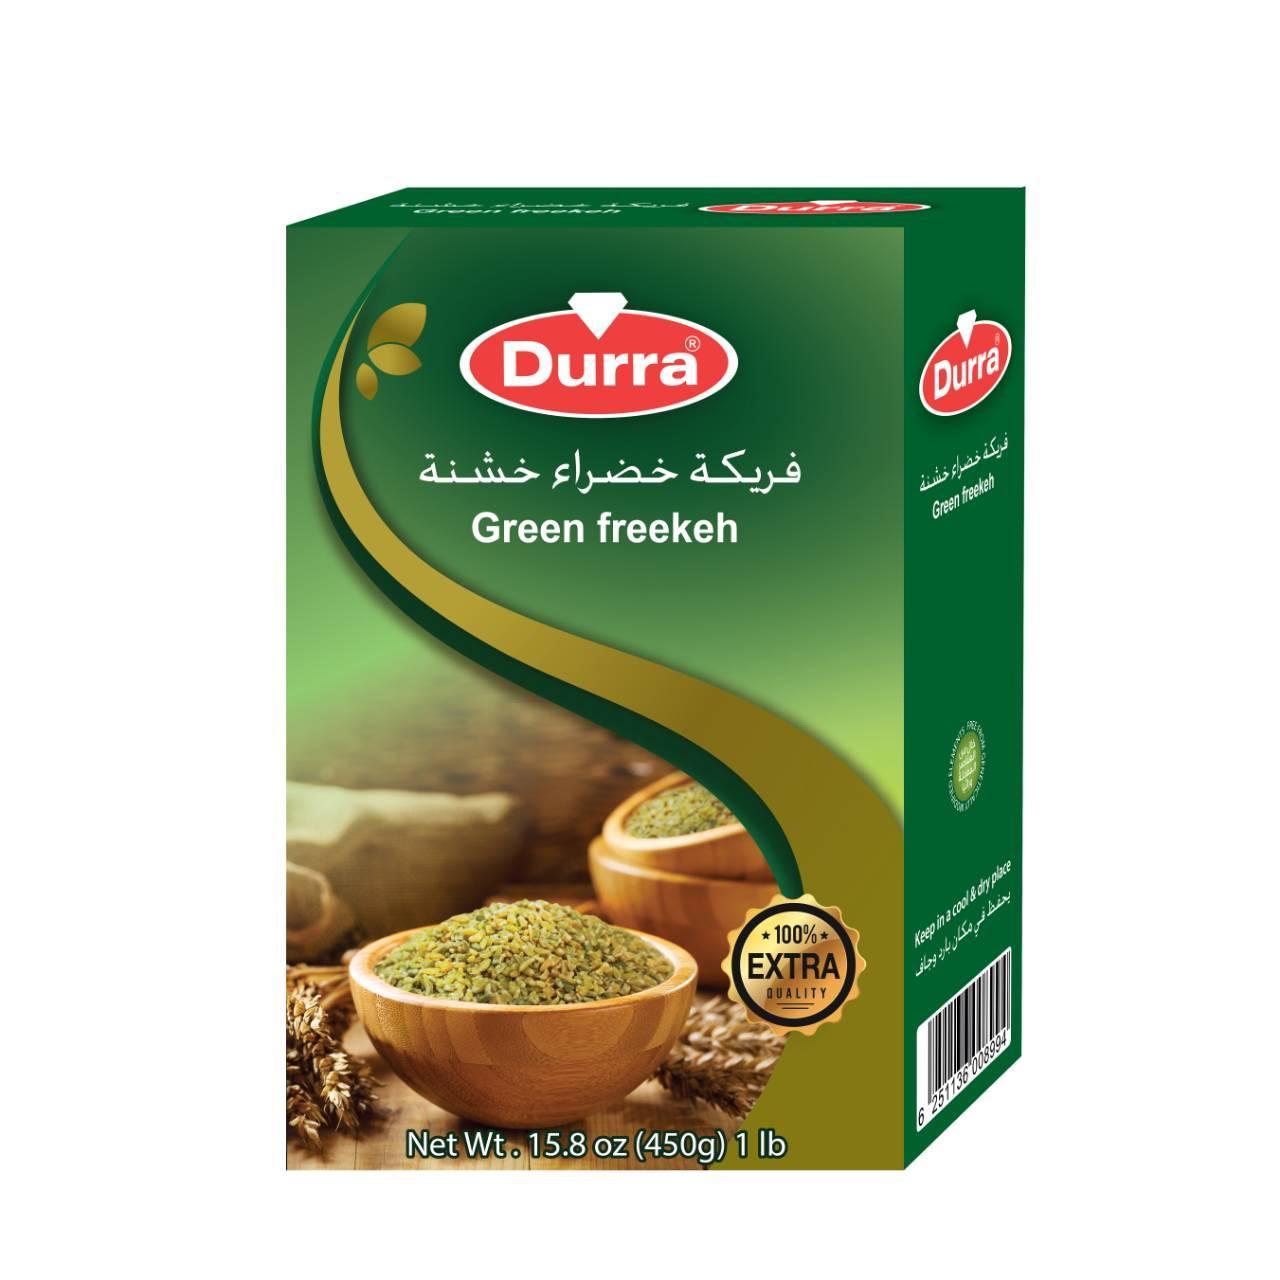 Фрике,крупа пшеничная Durra 450 грамм